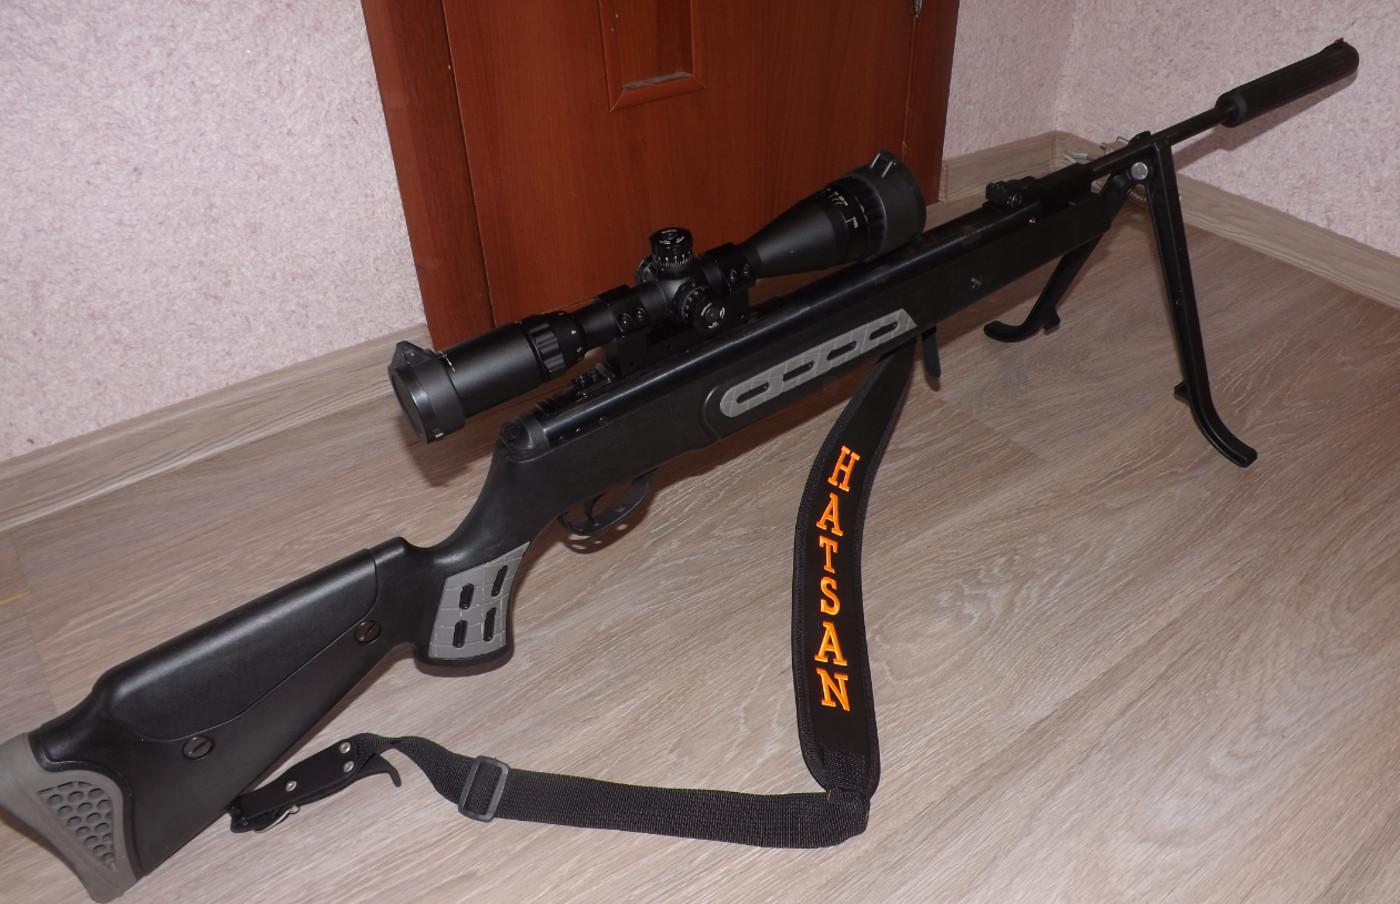 хатсан 125 для охоты